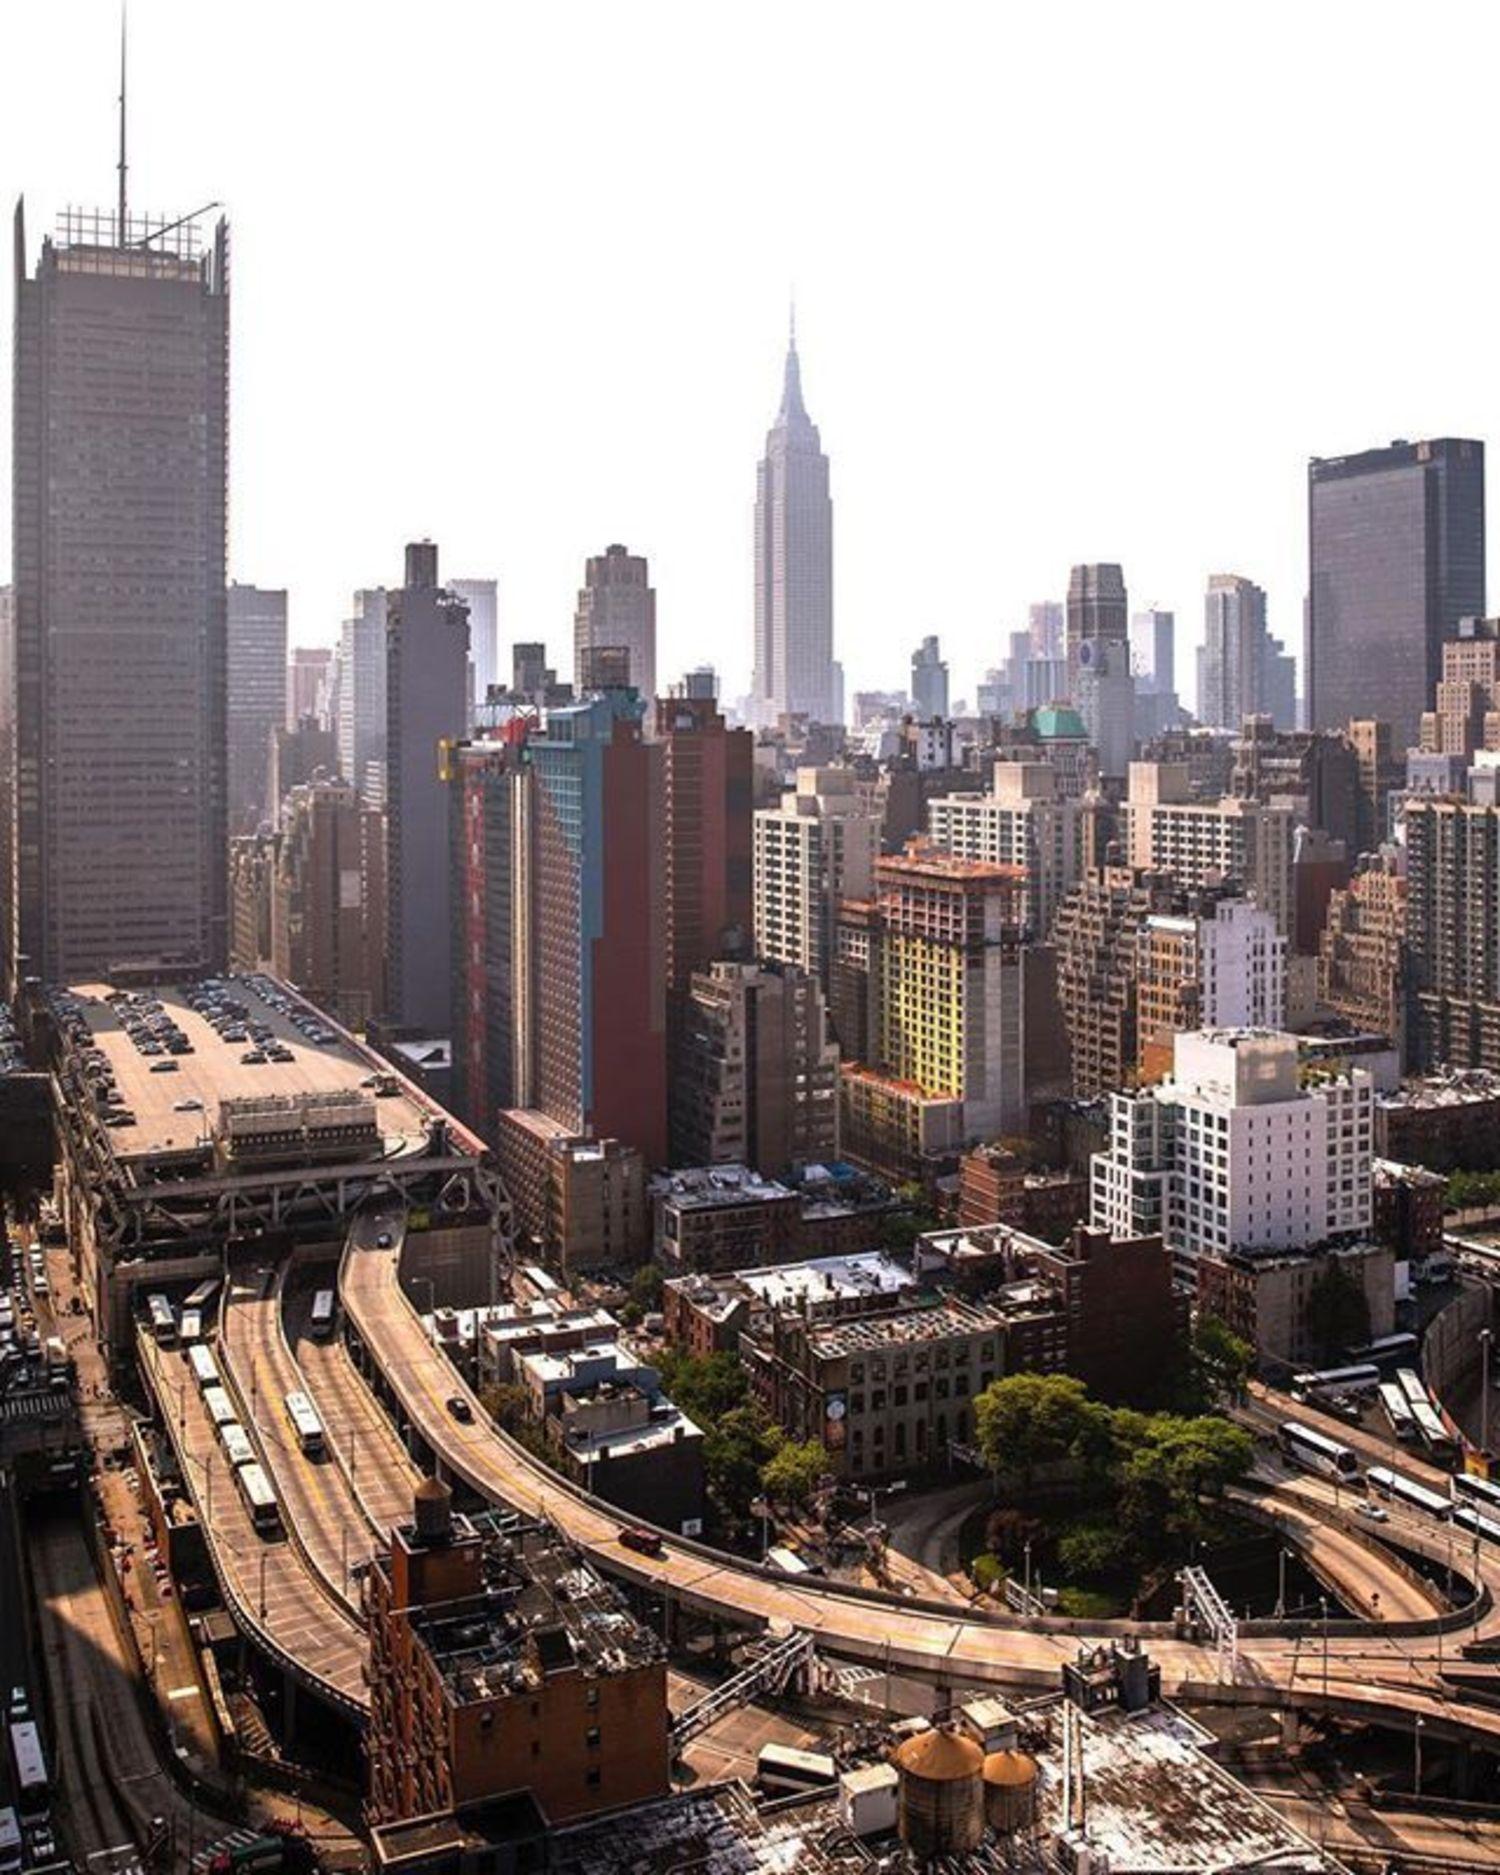 New York, New York. Photo via @craigsbeds #viewingnyc #newyork #newyorkcity #nyc